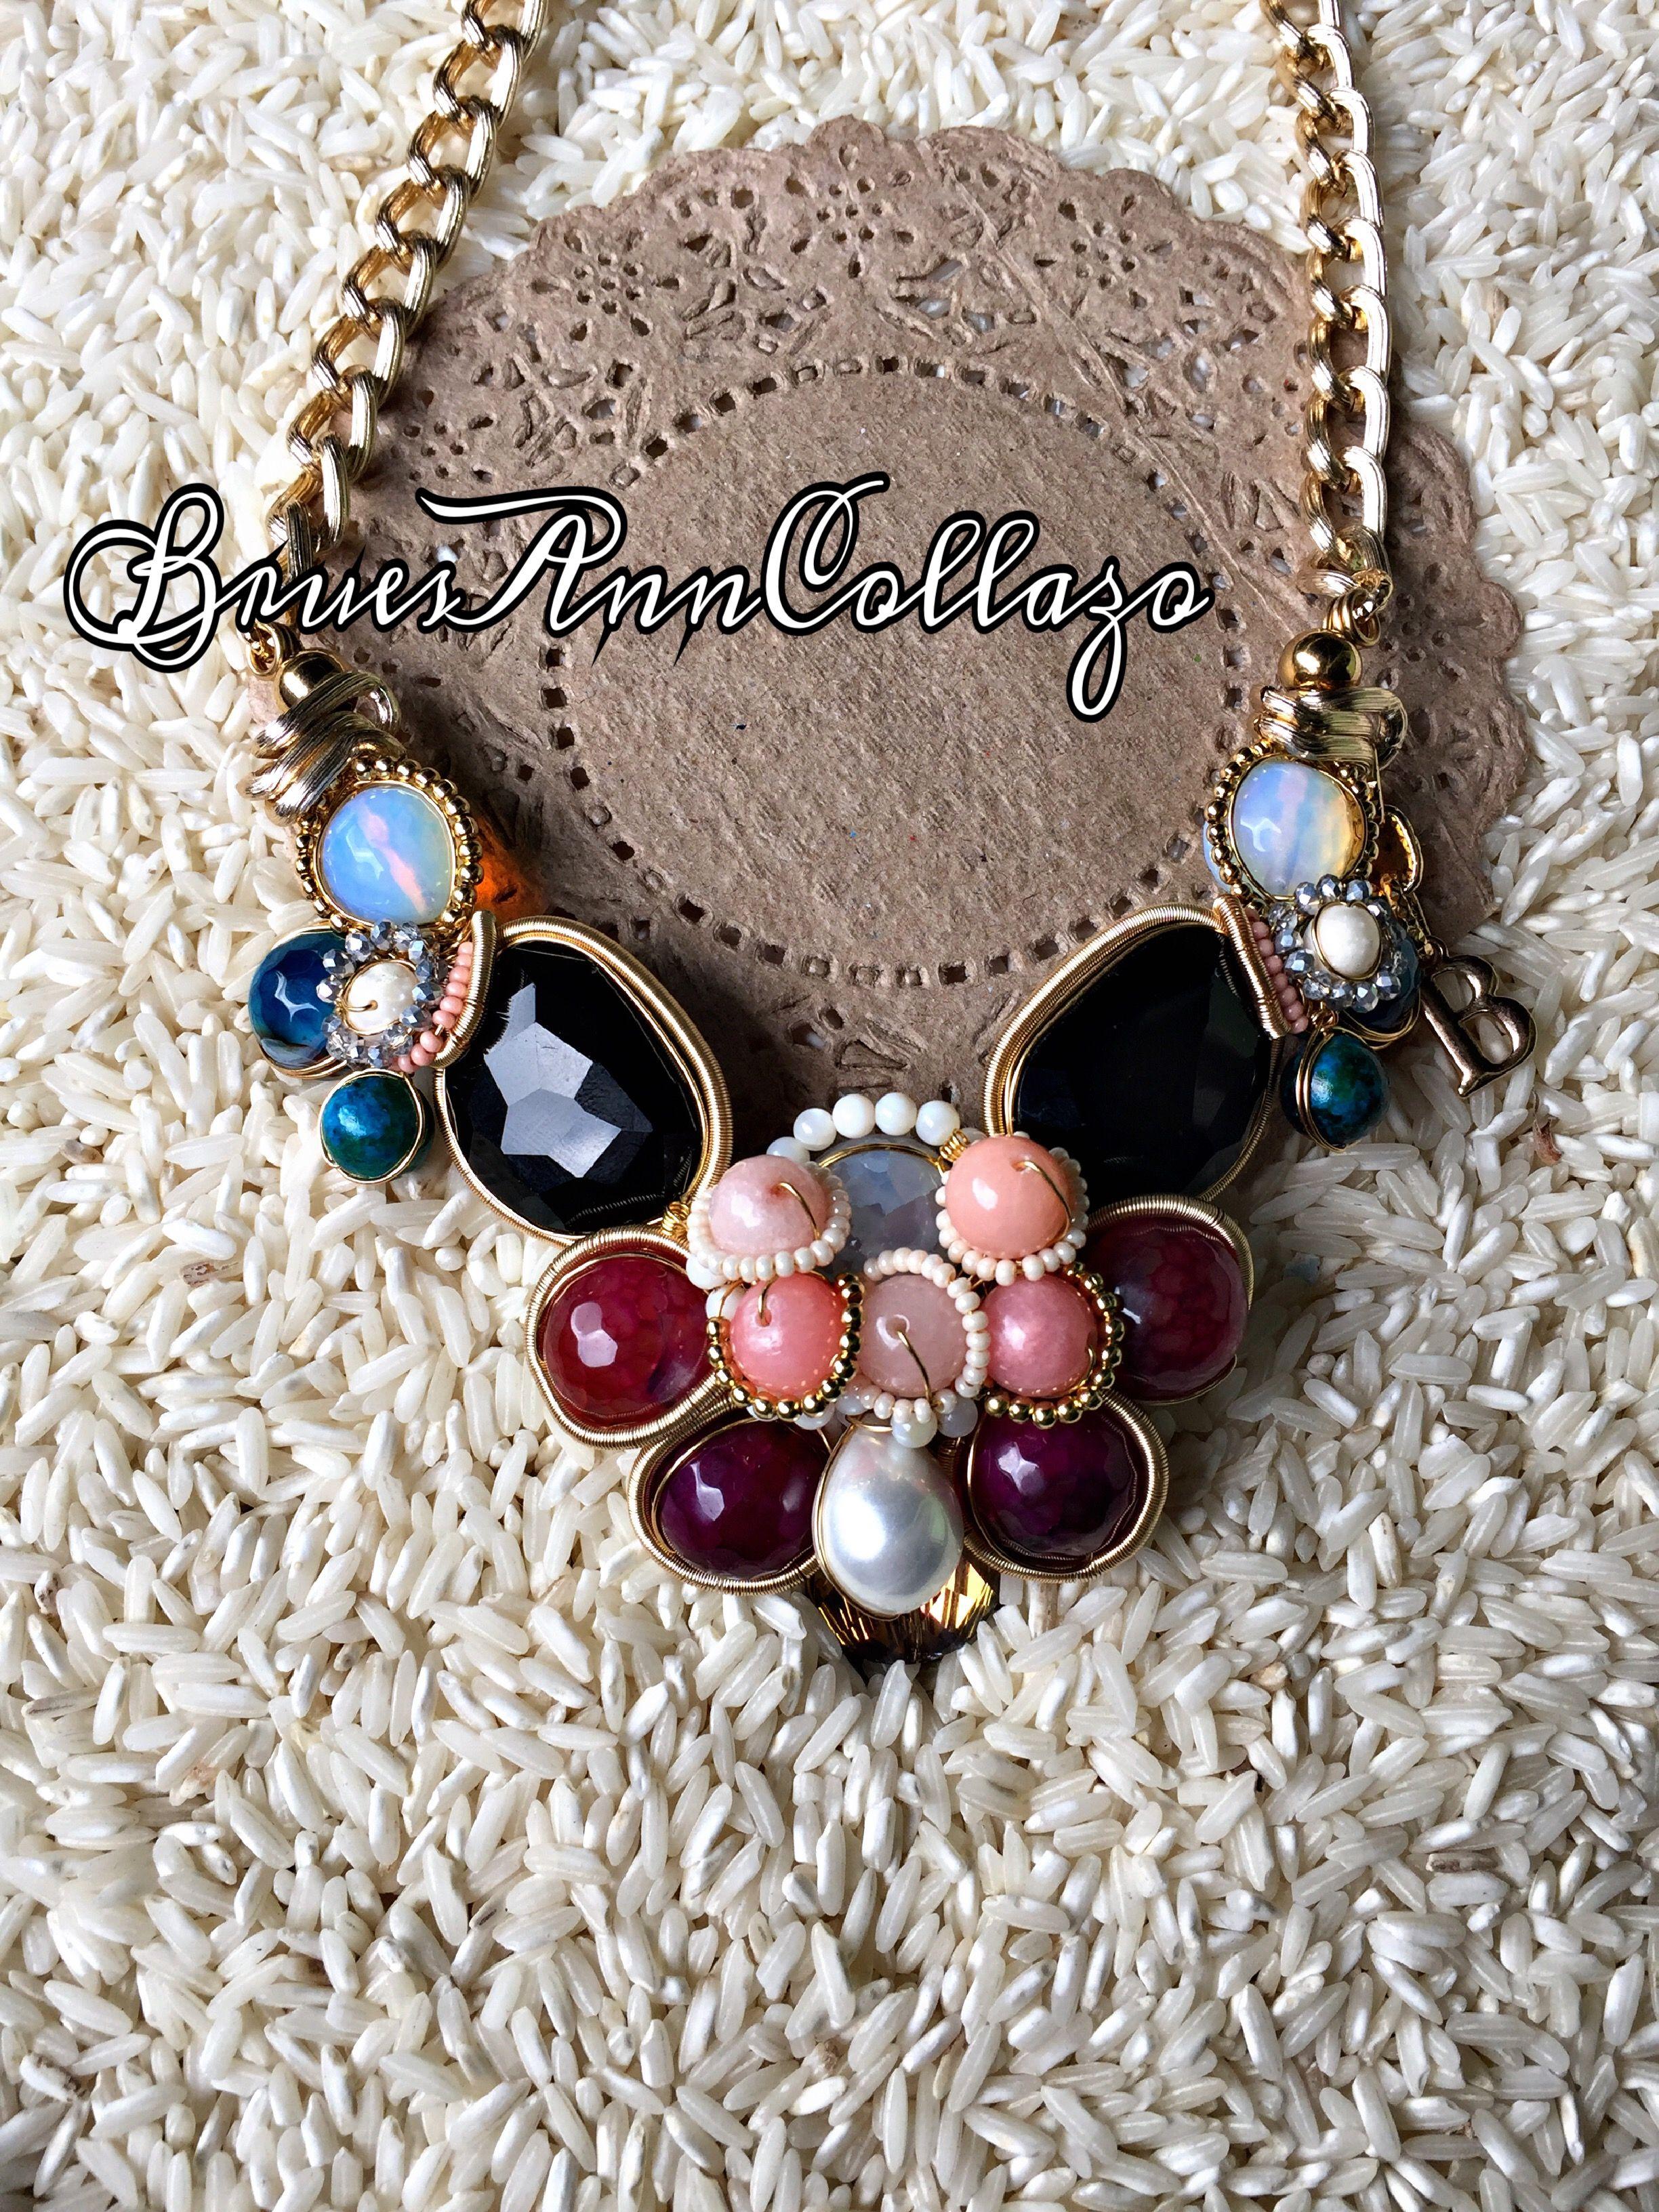 f4334fc9938a Collar alambrismo  BruesAnnCollazo  alambrismo  wirejewelry  wire  joyeria   joyeriaartesanal  necklace